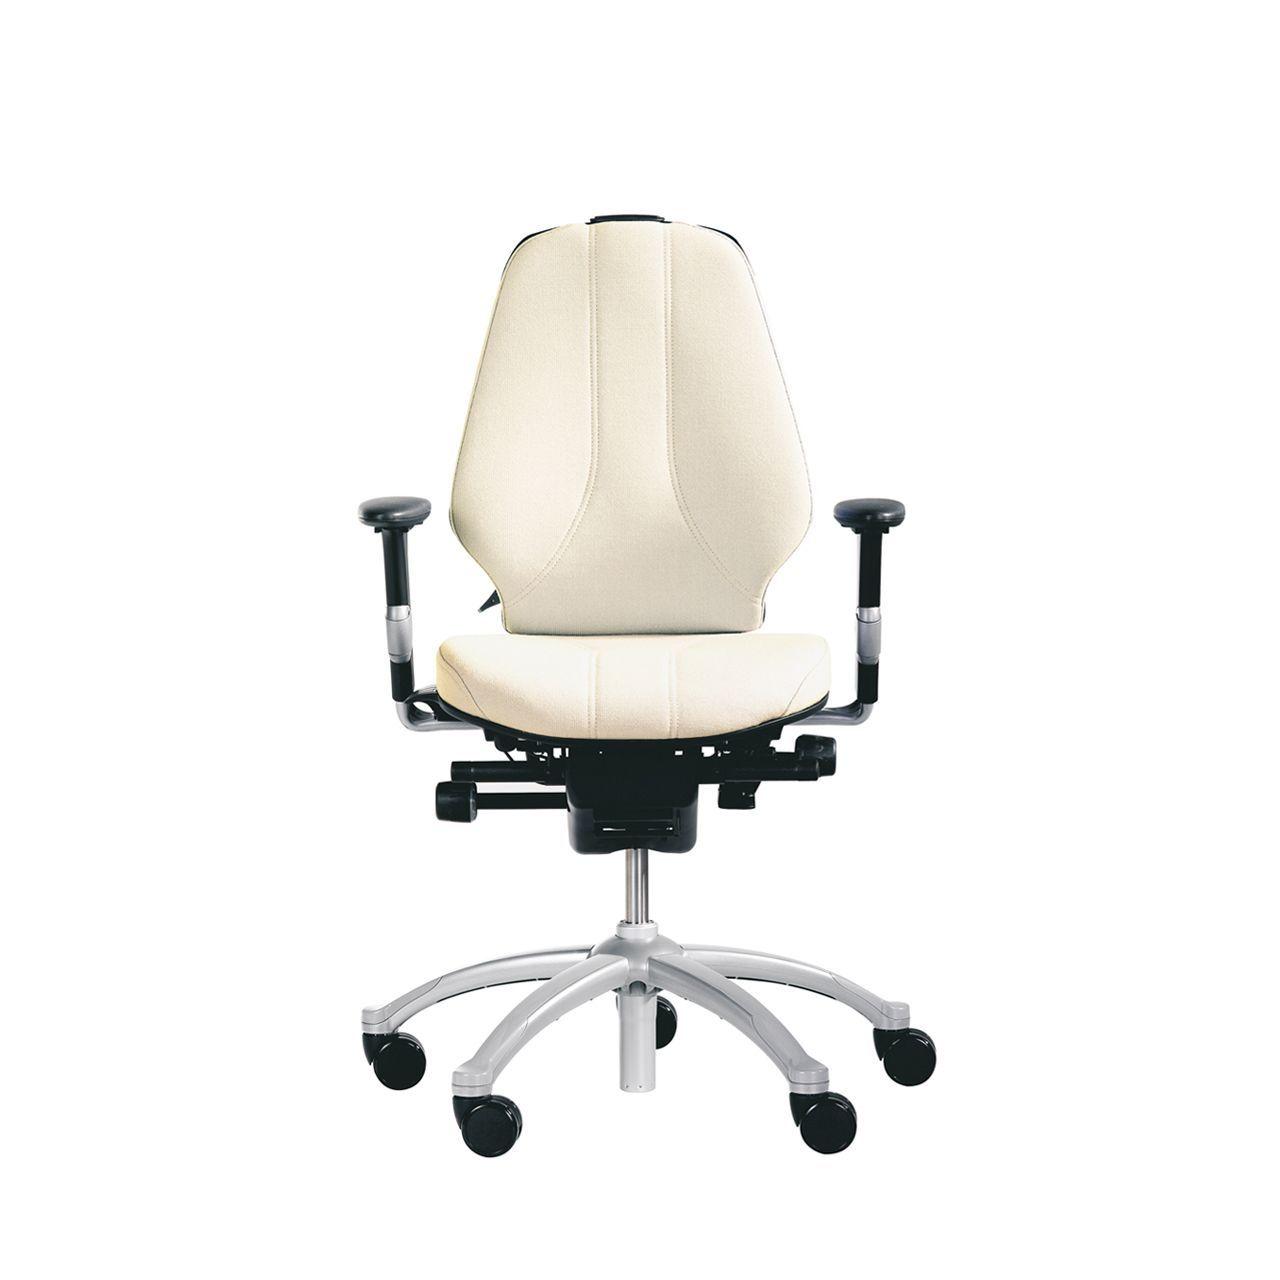 rh logic 300 xl bureaustoel STKALOG303 wit